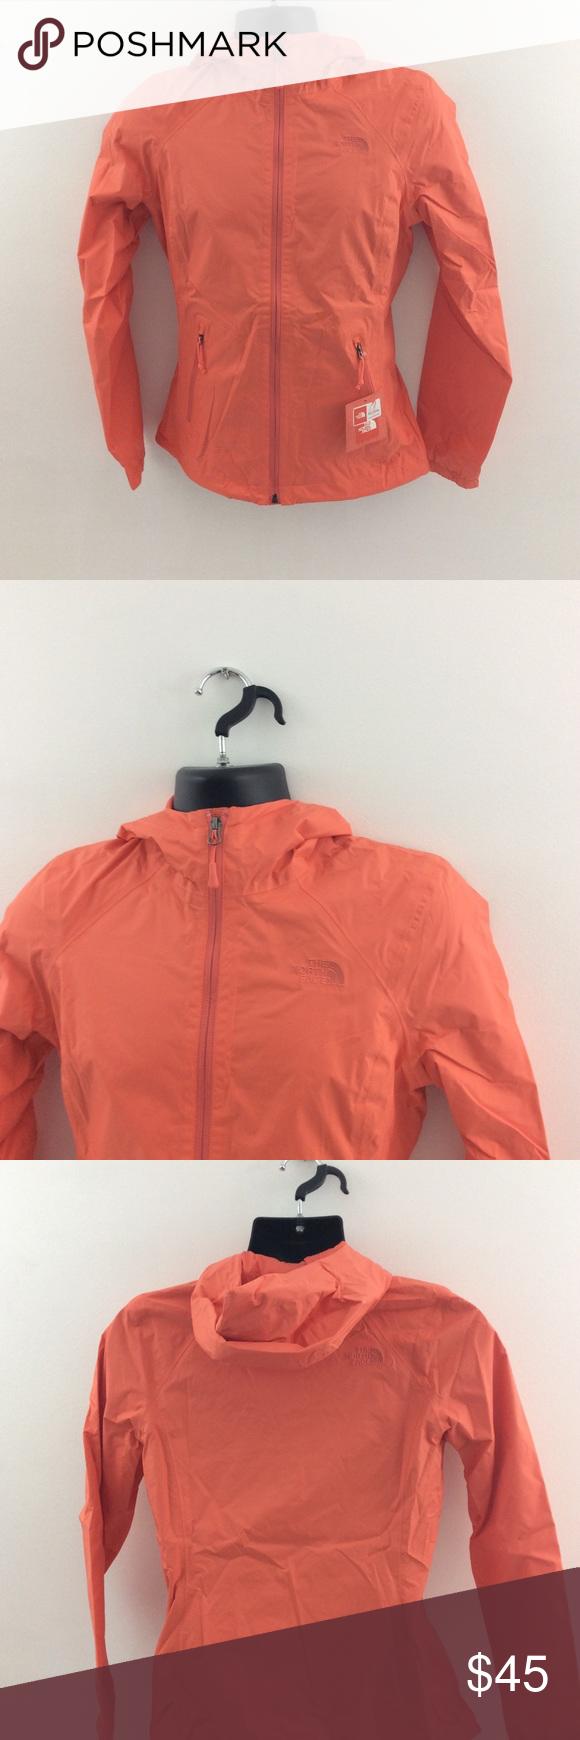 8aa966355 The North Face Boreal Jacket D32 NWT | My Posh Picks | Pinterest ...